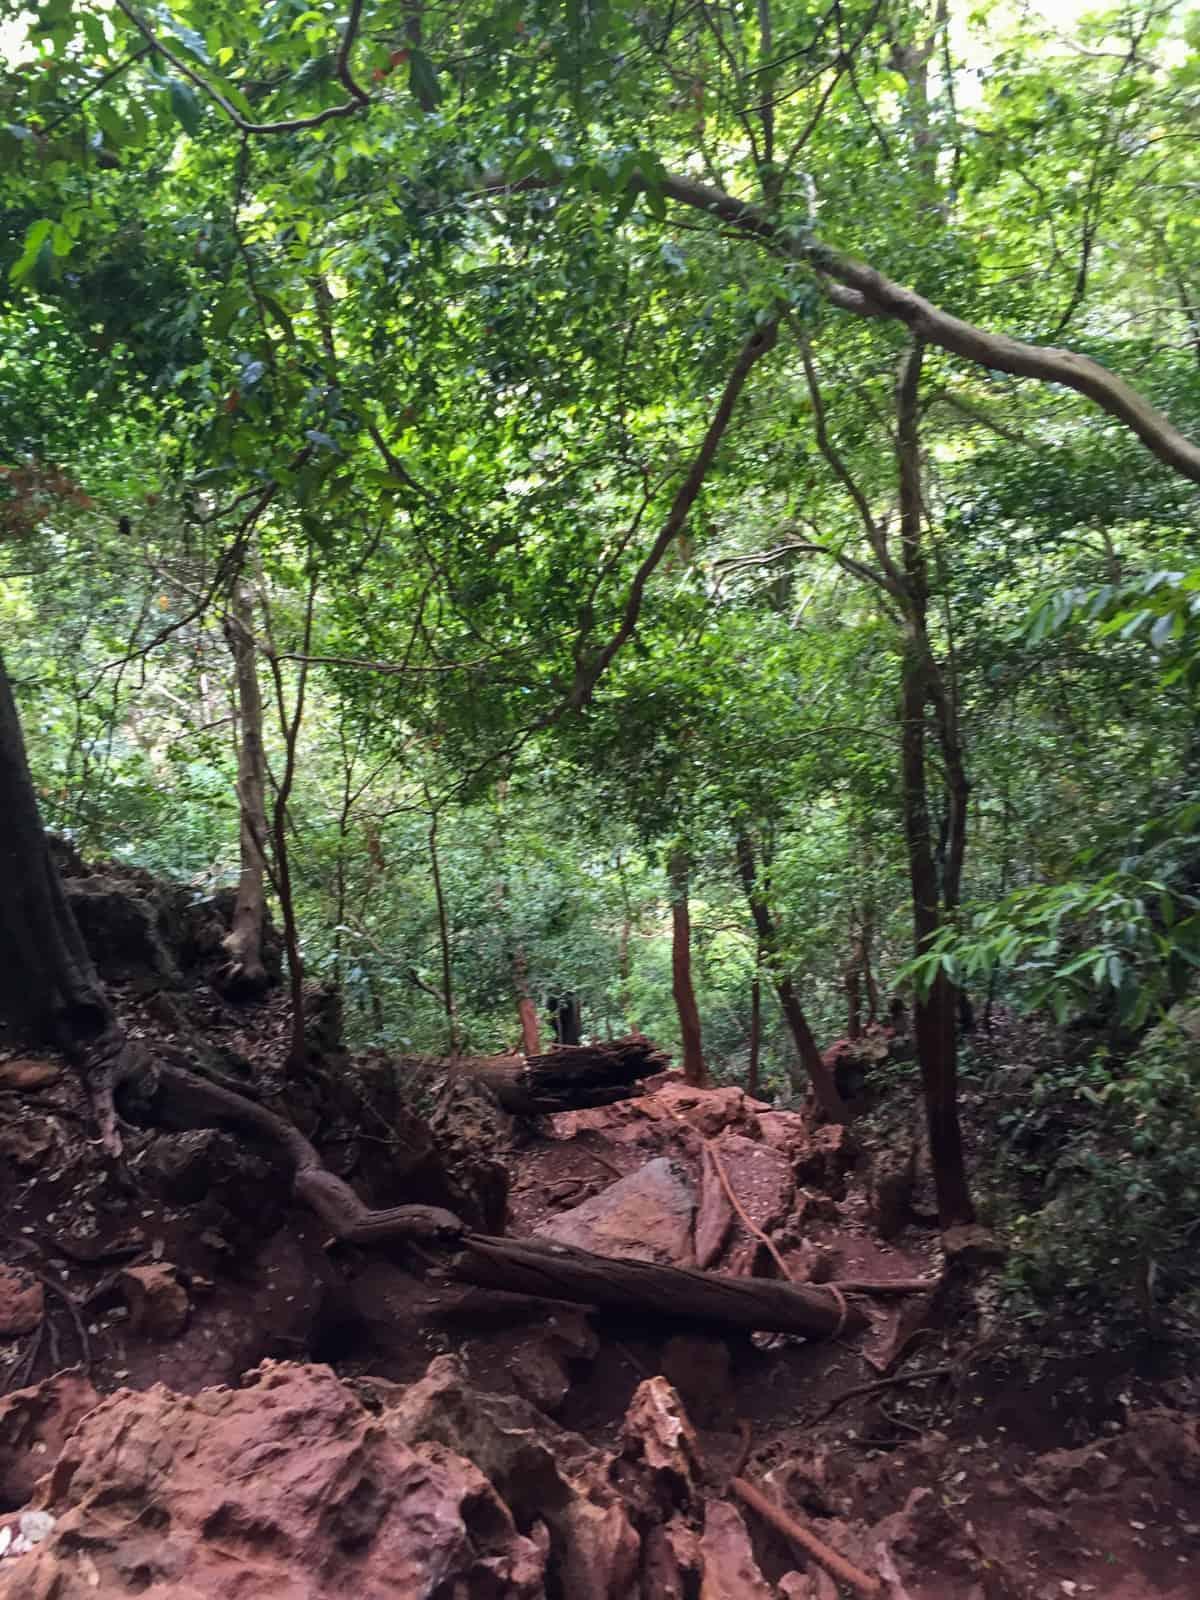 Hiking to Hidden Lagoon on Railay Peninsula